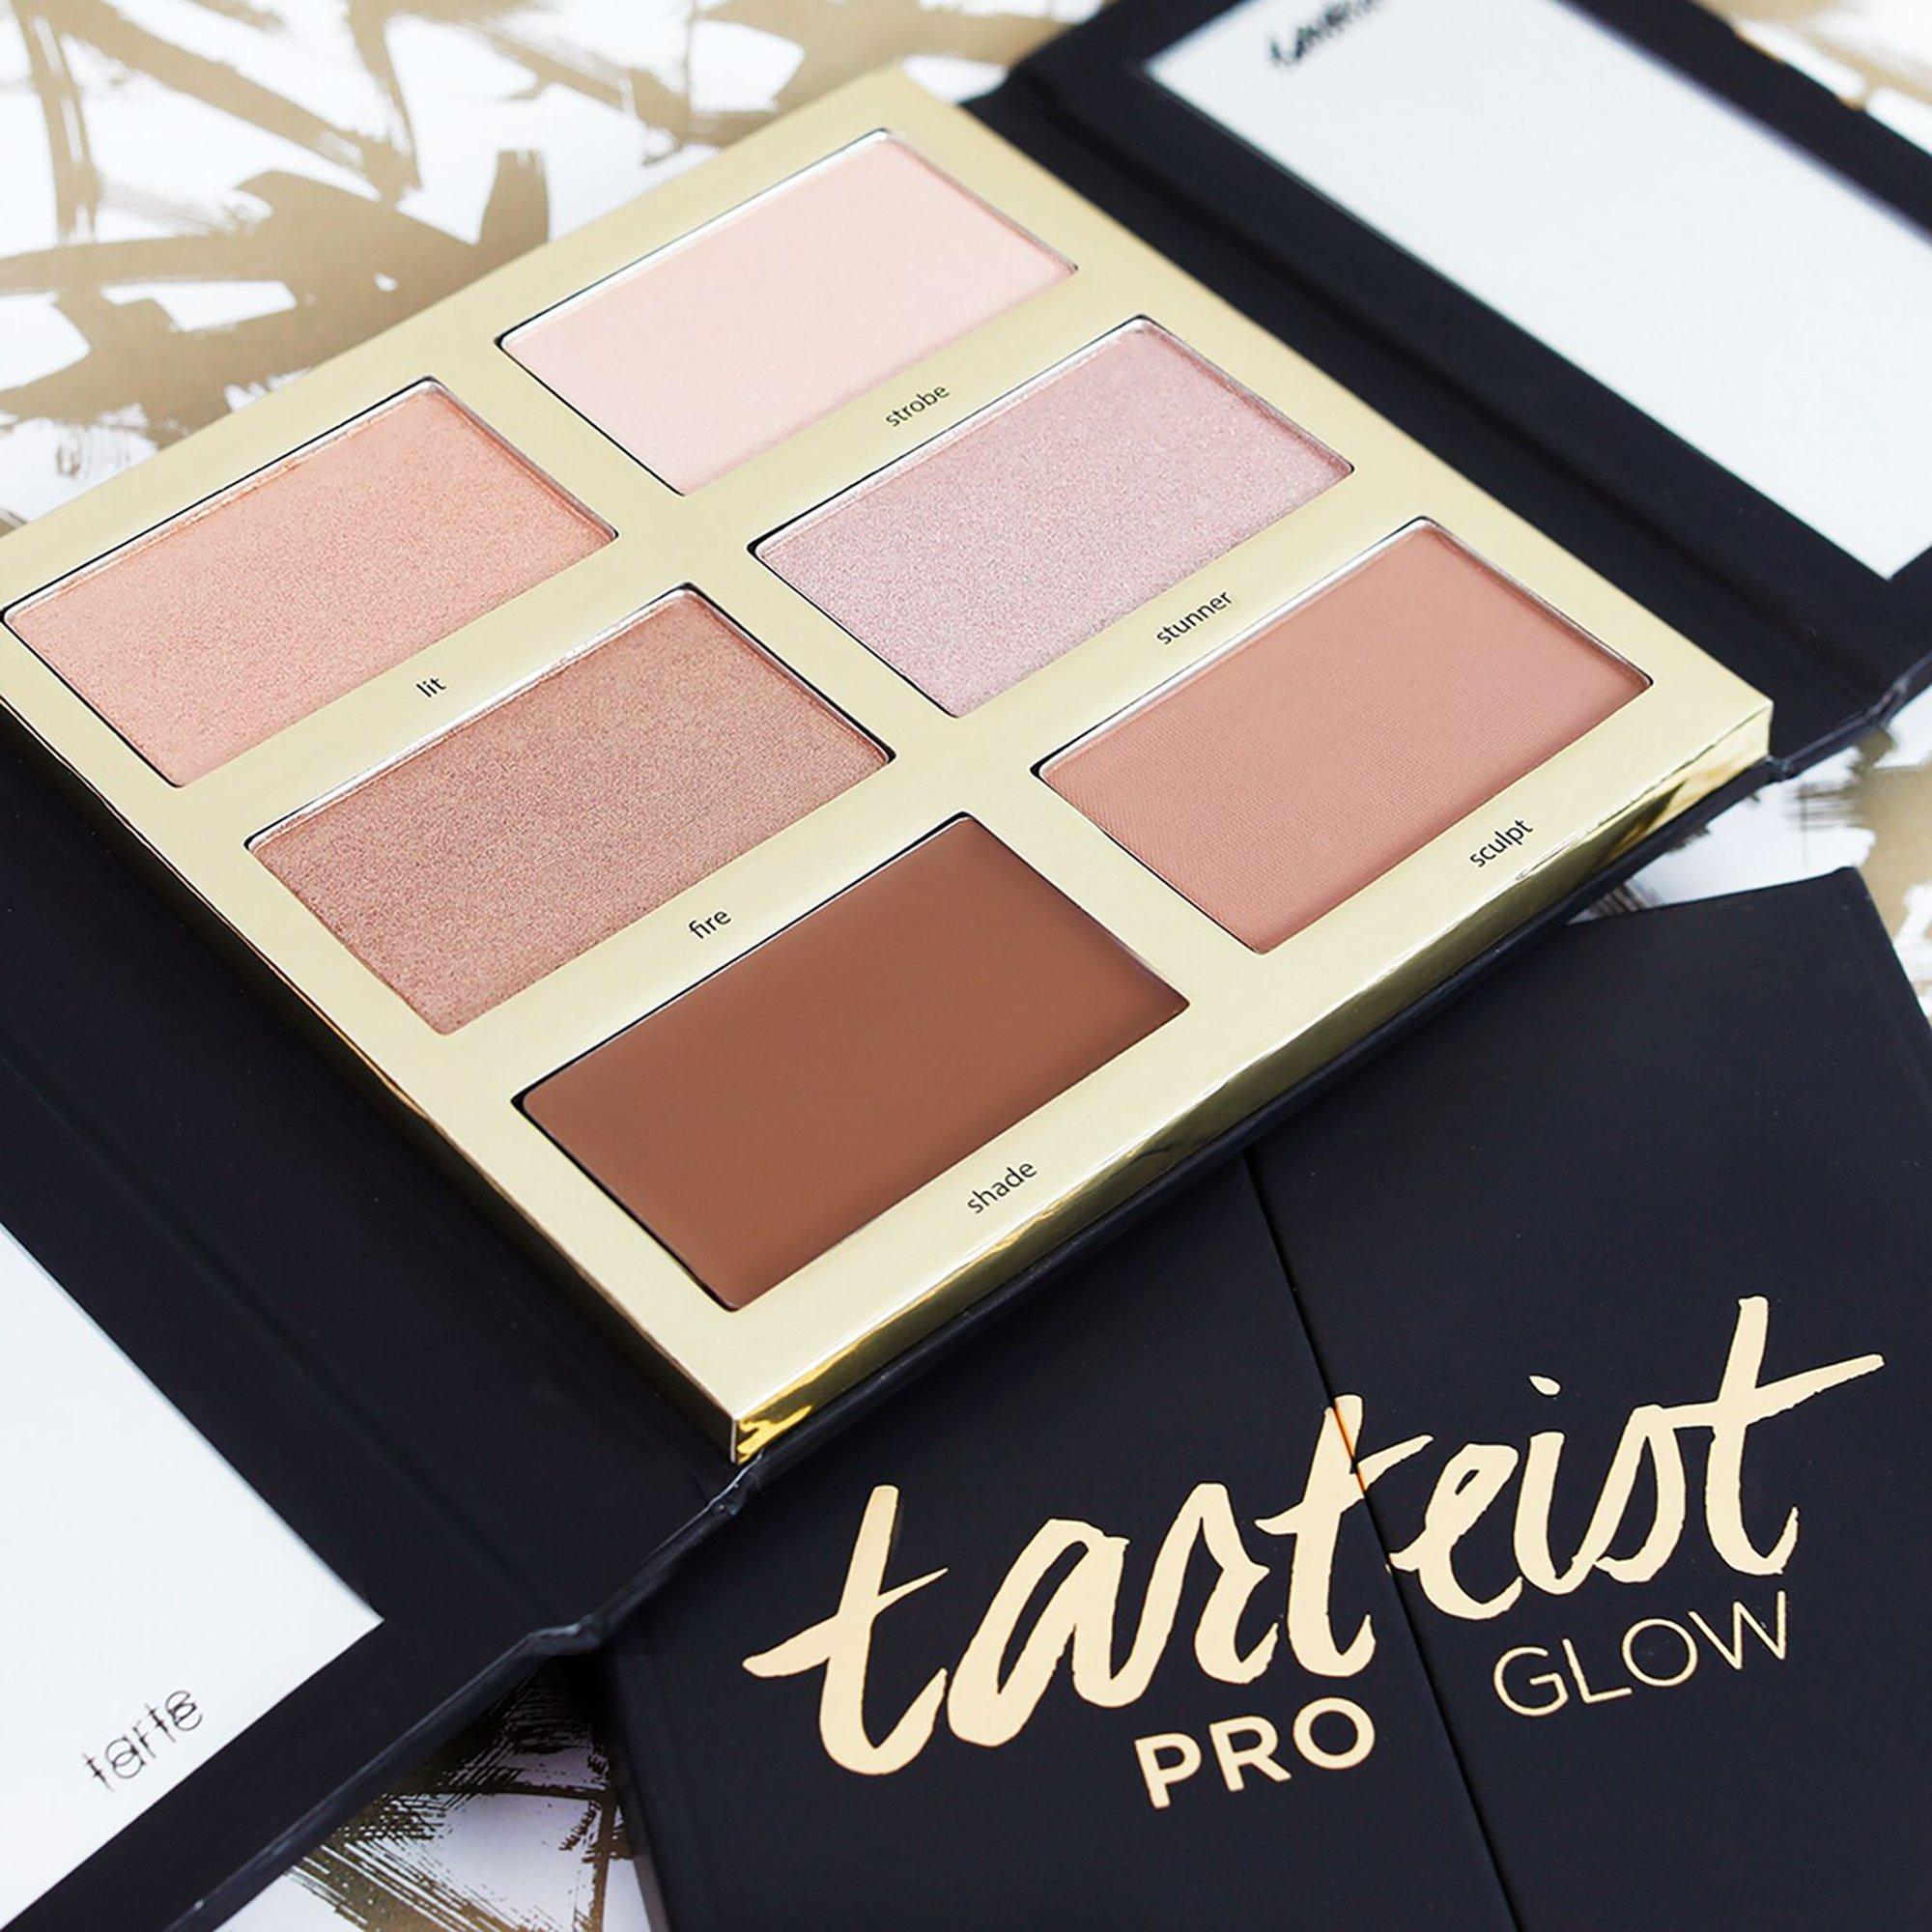 tarteist PRO glow highlight contour palette by Tarte (Image #6)